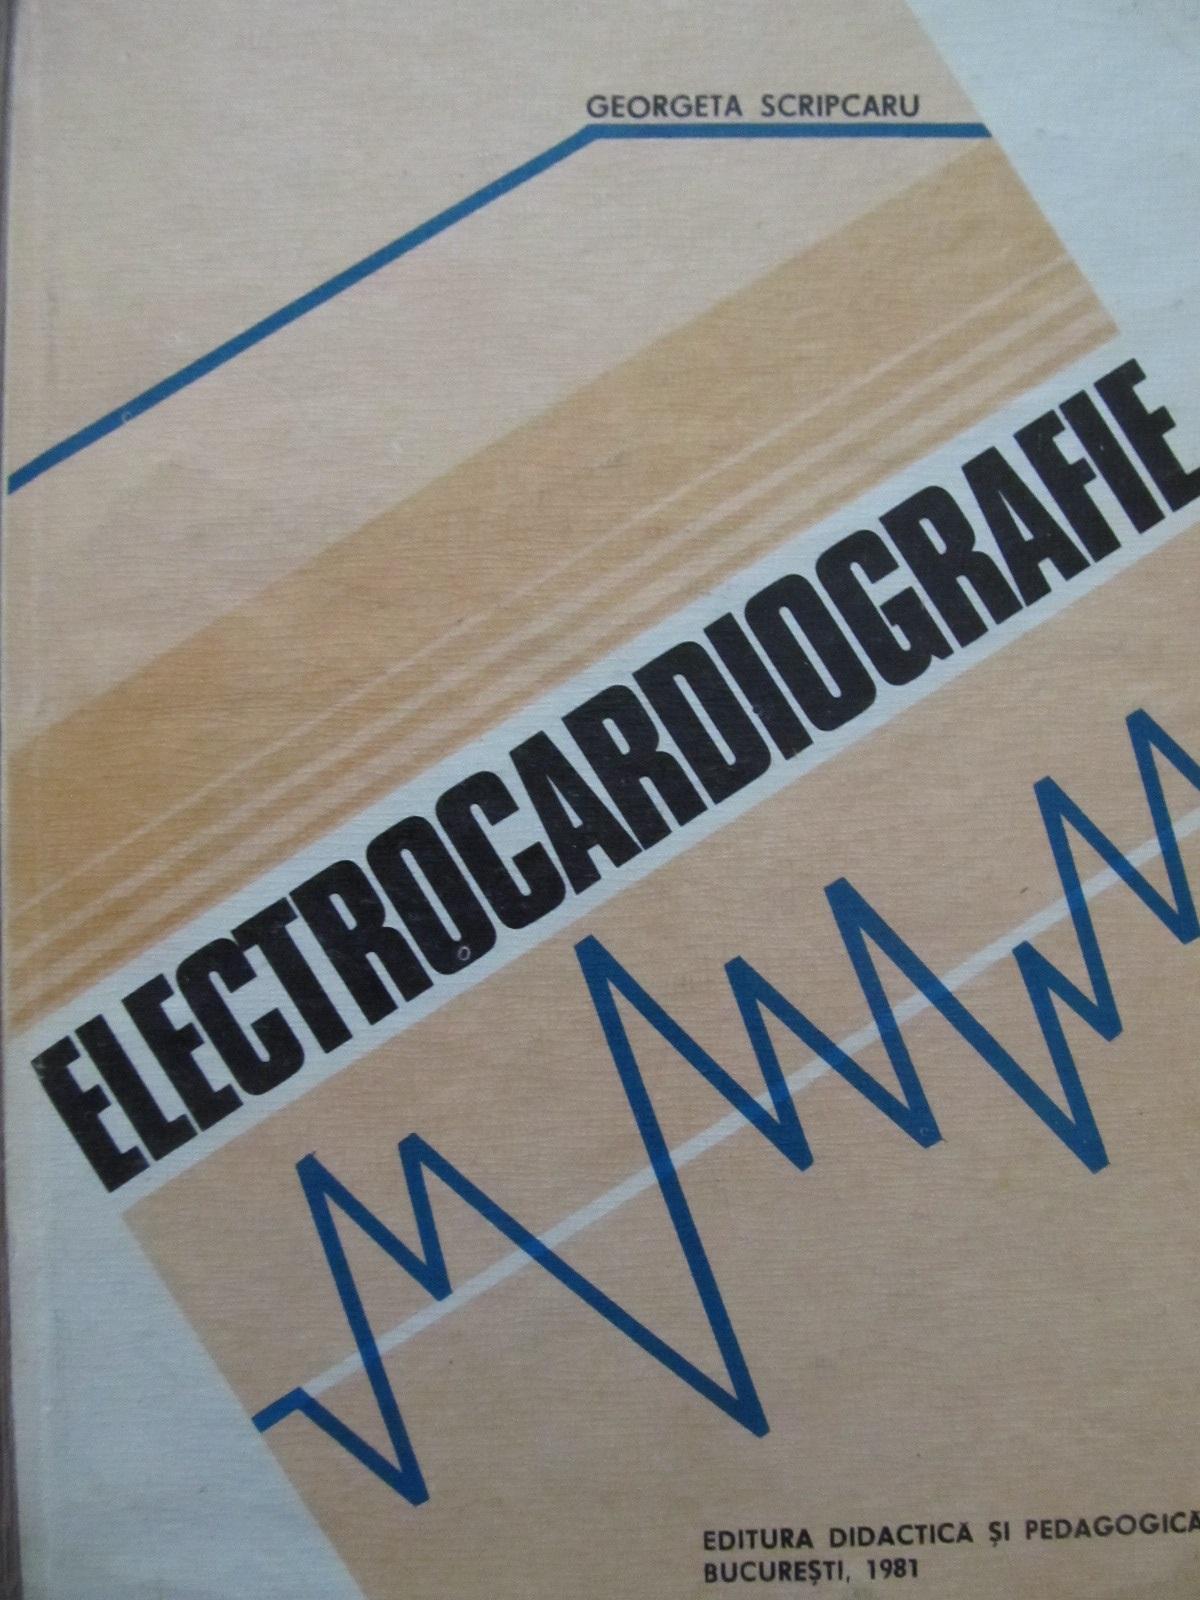 Electrocardiografie - Georgeta Scripcaru | Detalii carte